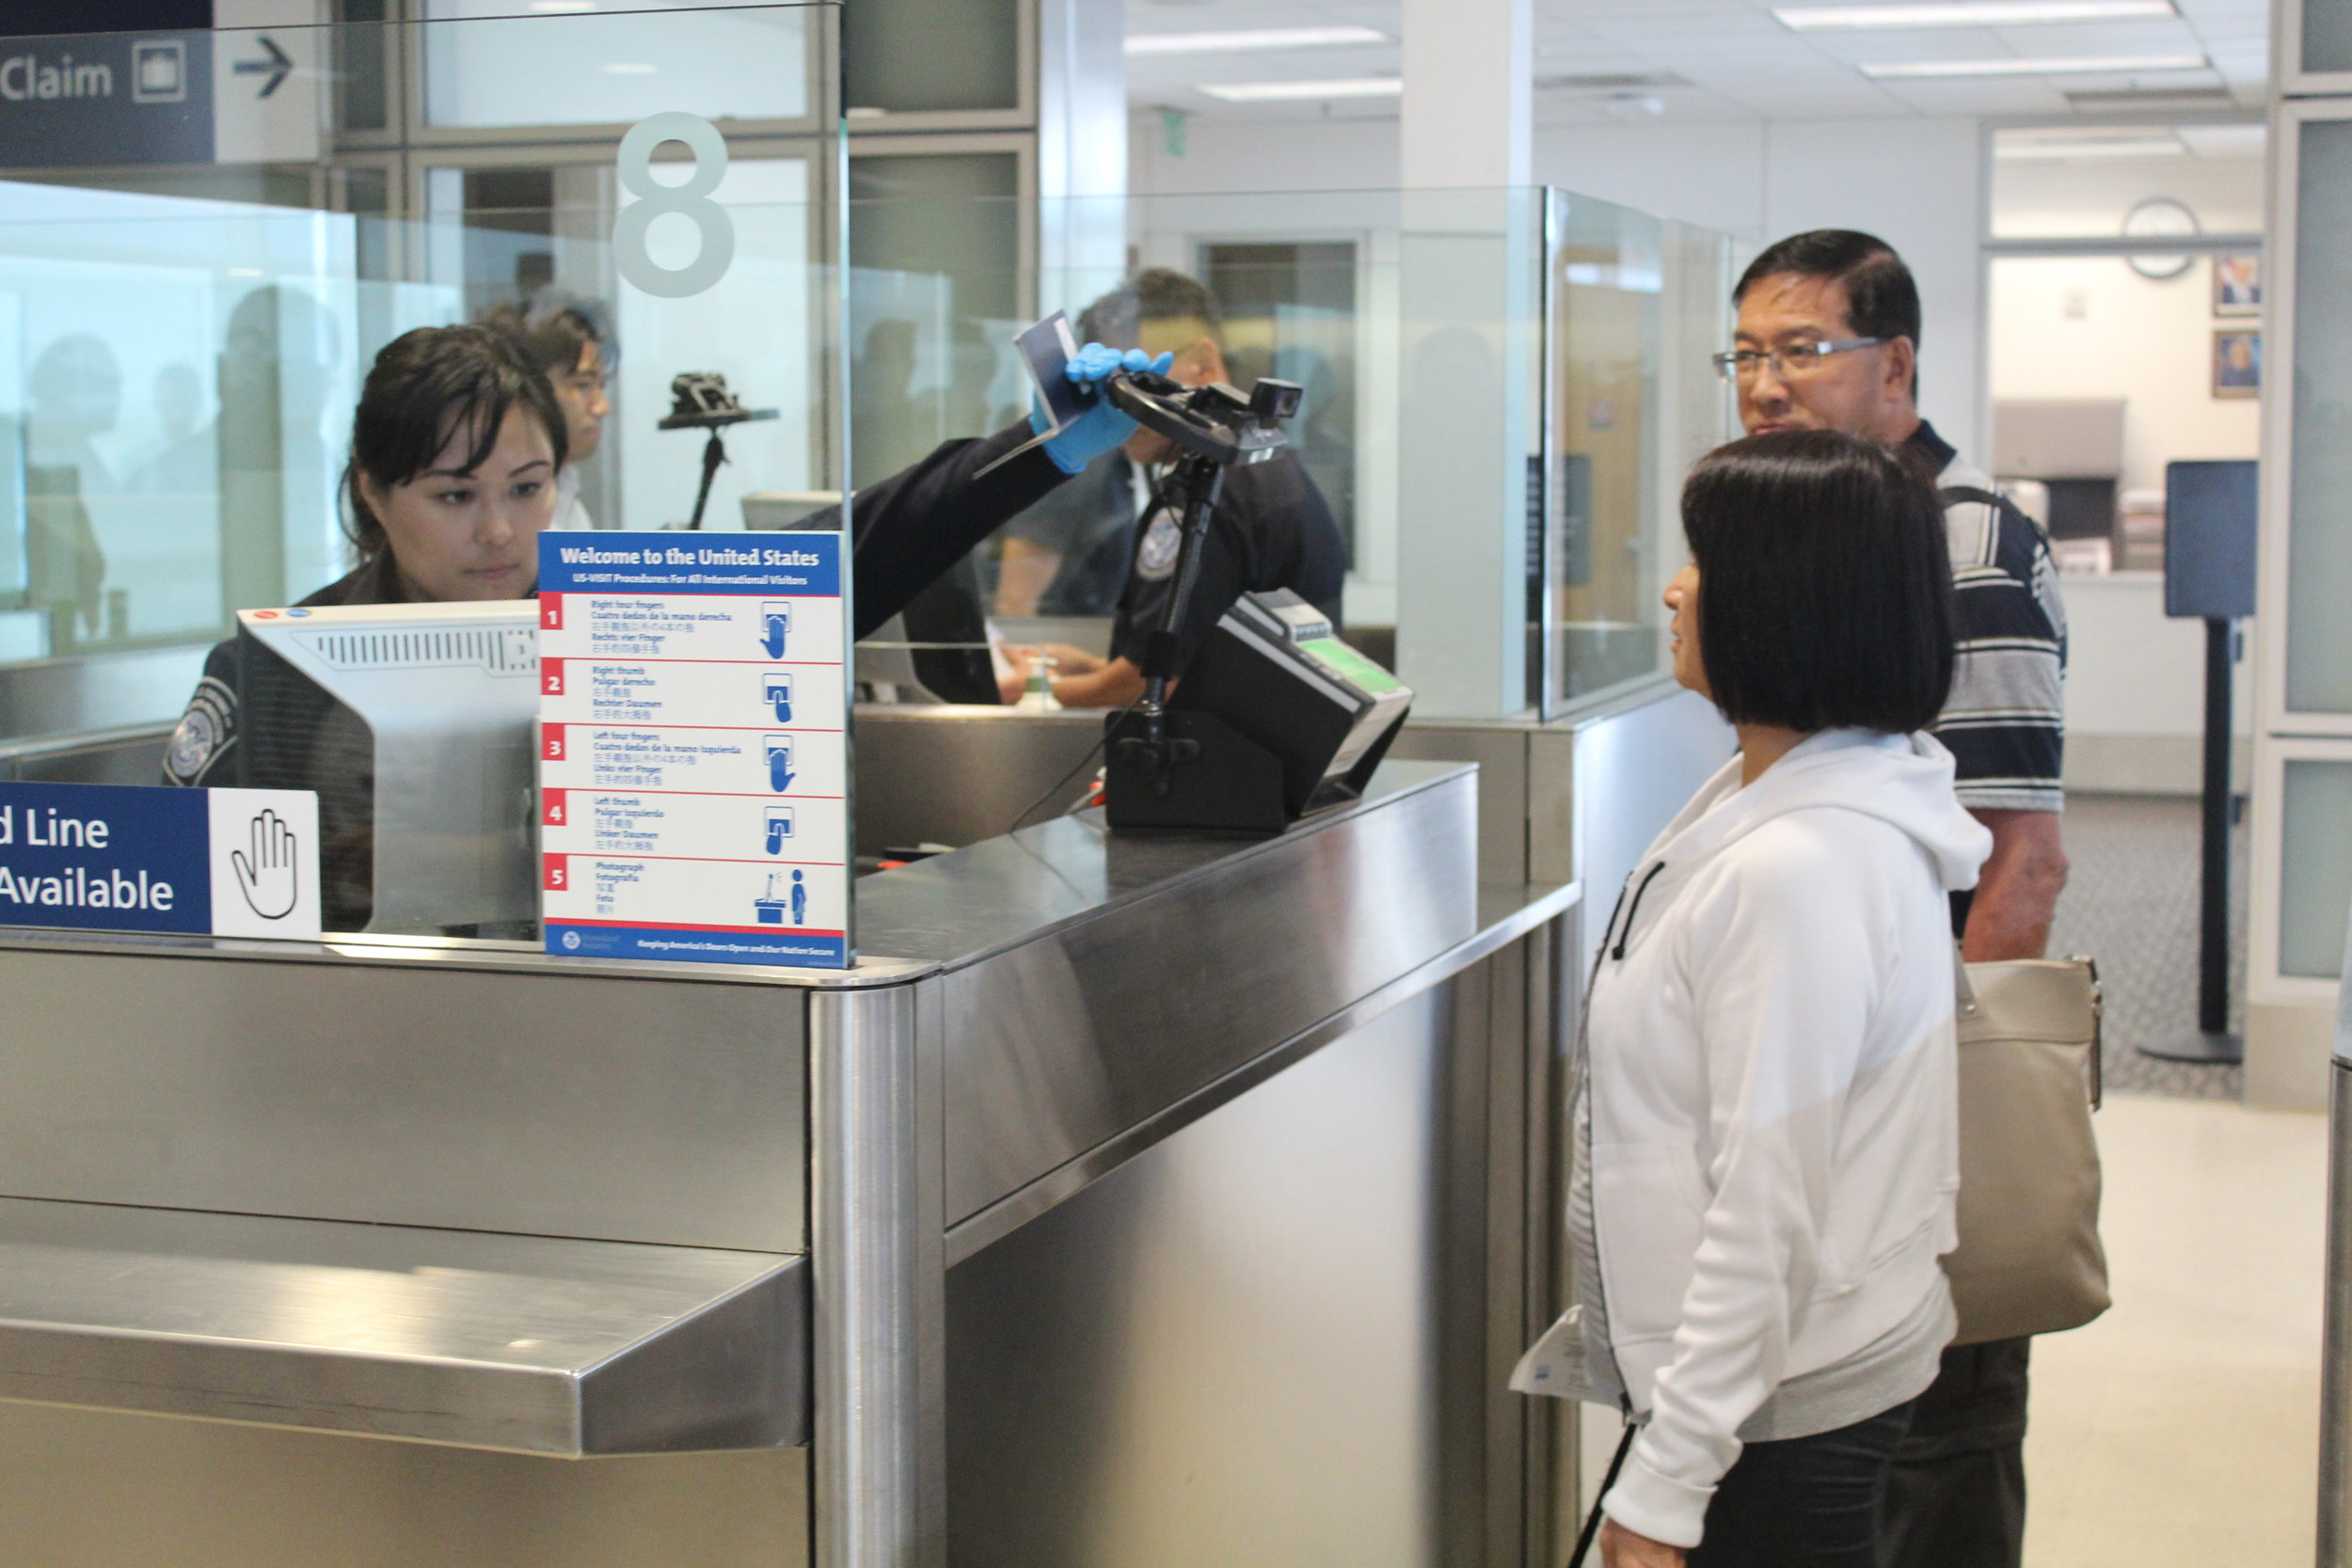 Mineta San Jose International Airport Biometric Scanners